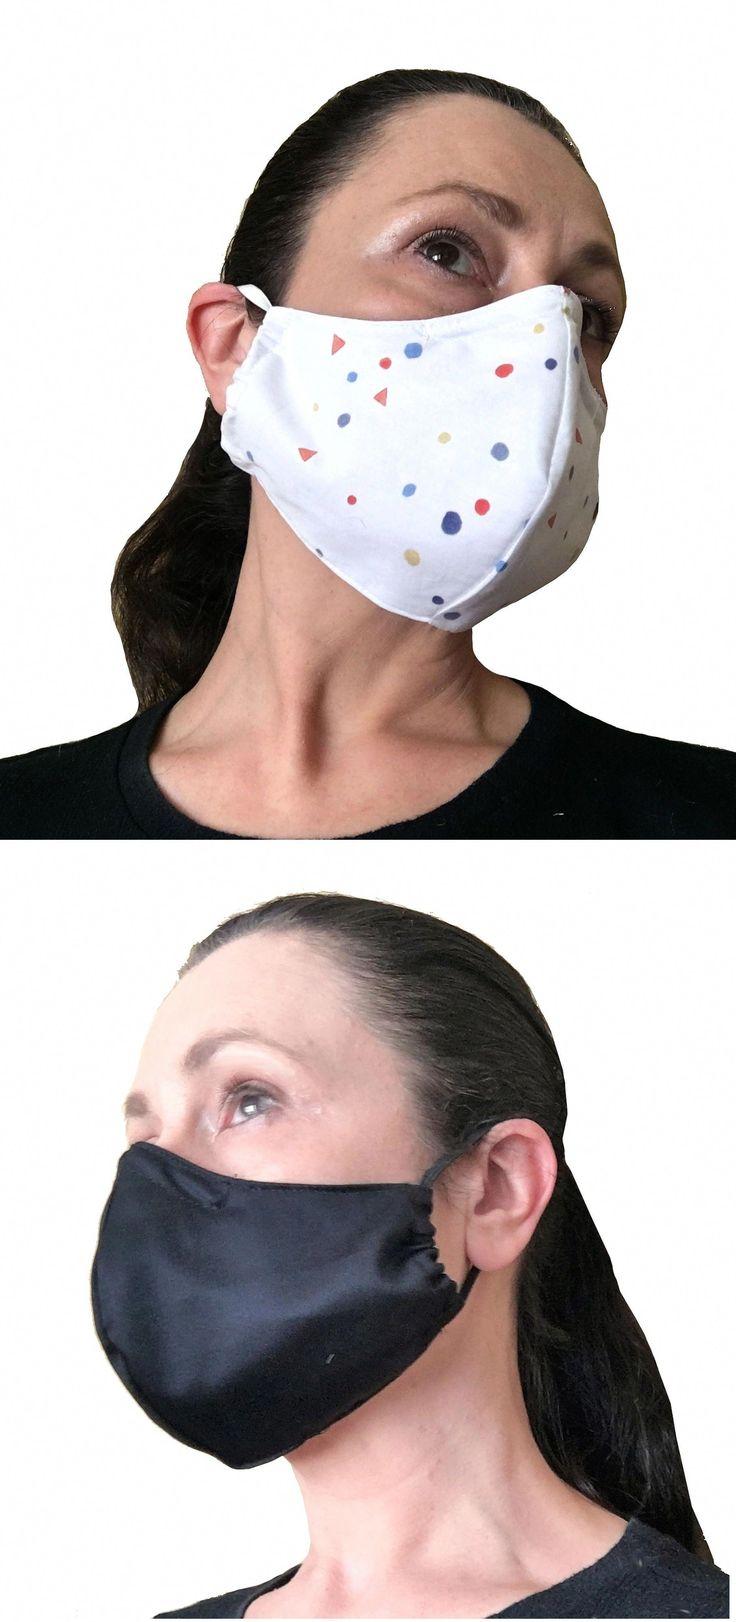 proshield n95 face mask in 2020 Diy face mask, Face mask